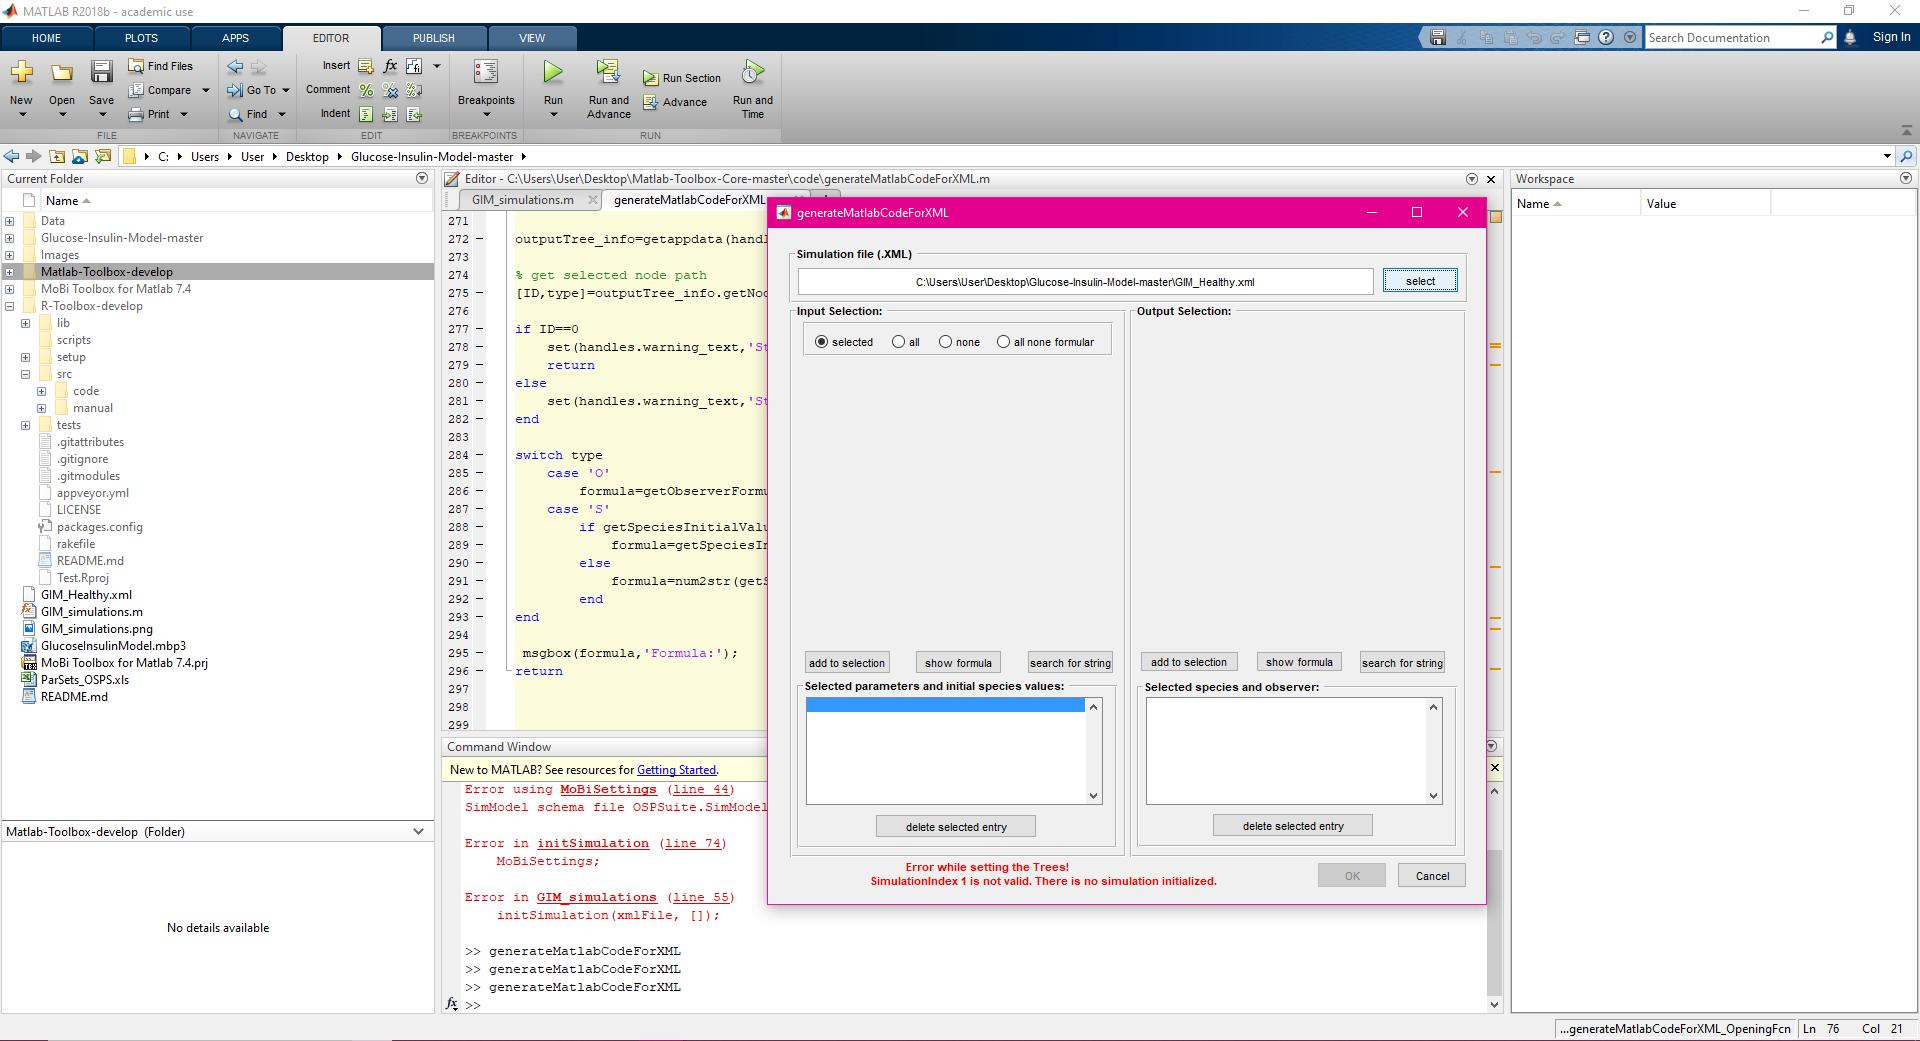 Cannot perform simulation in Matlab, (version 7 4 0), error